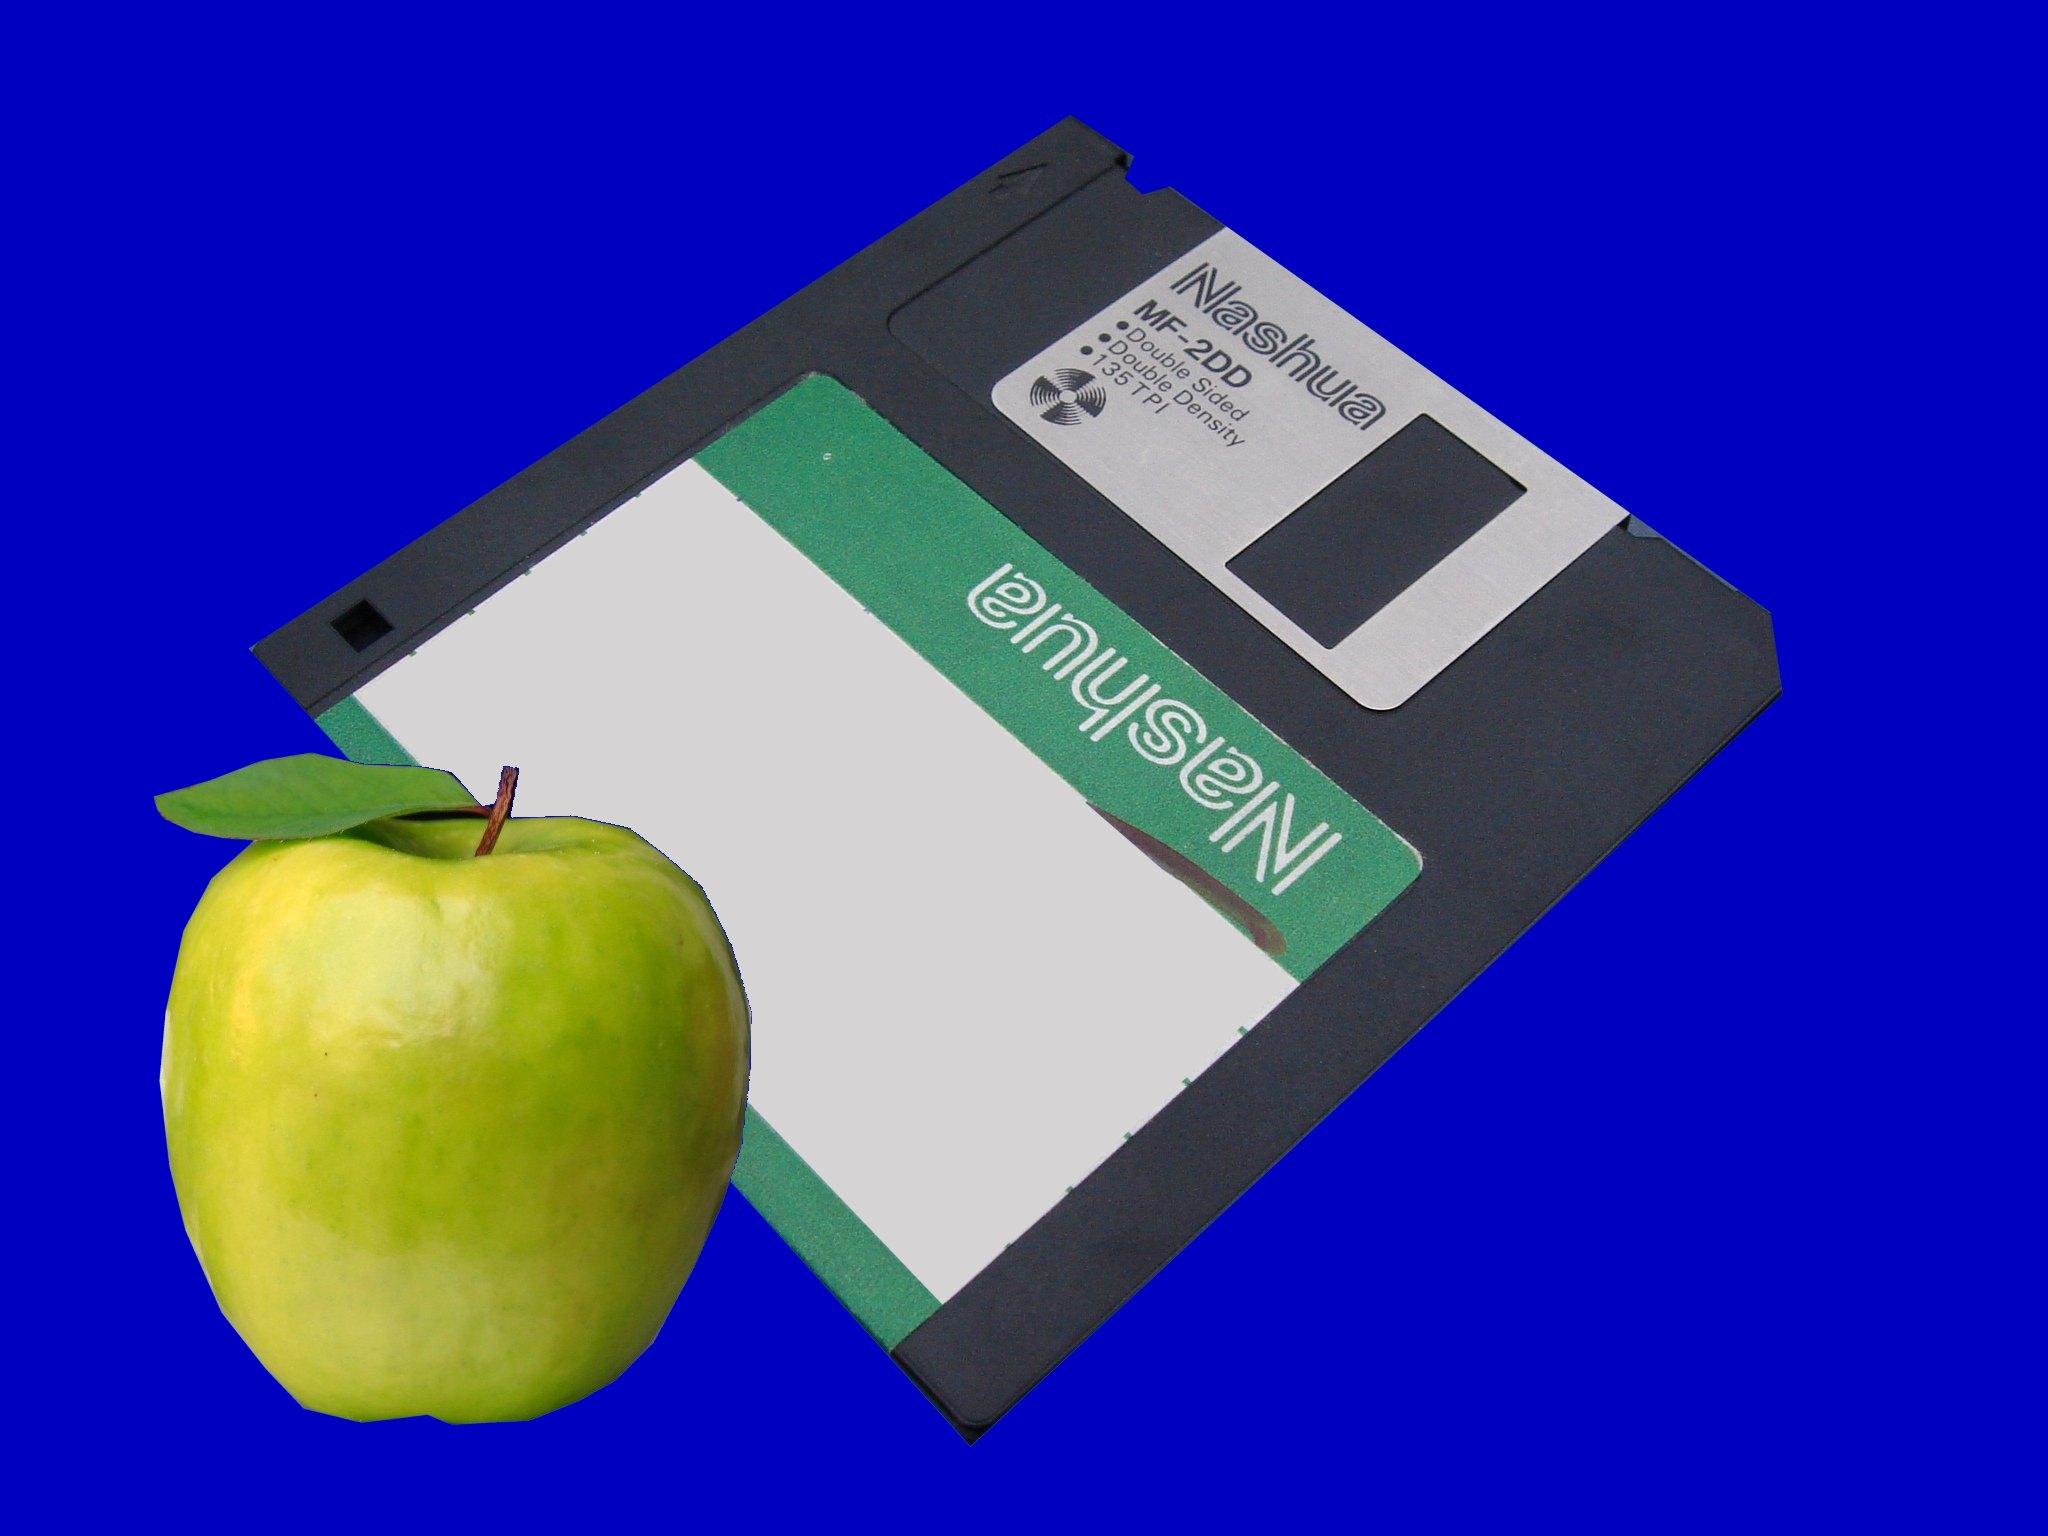 Classic Mac Floppy disk